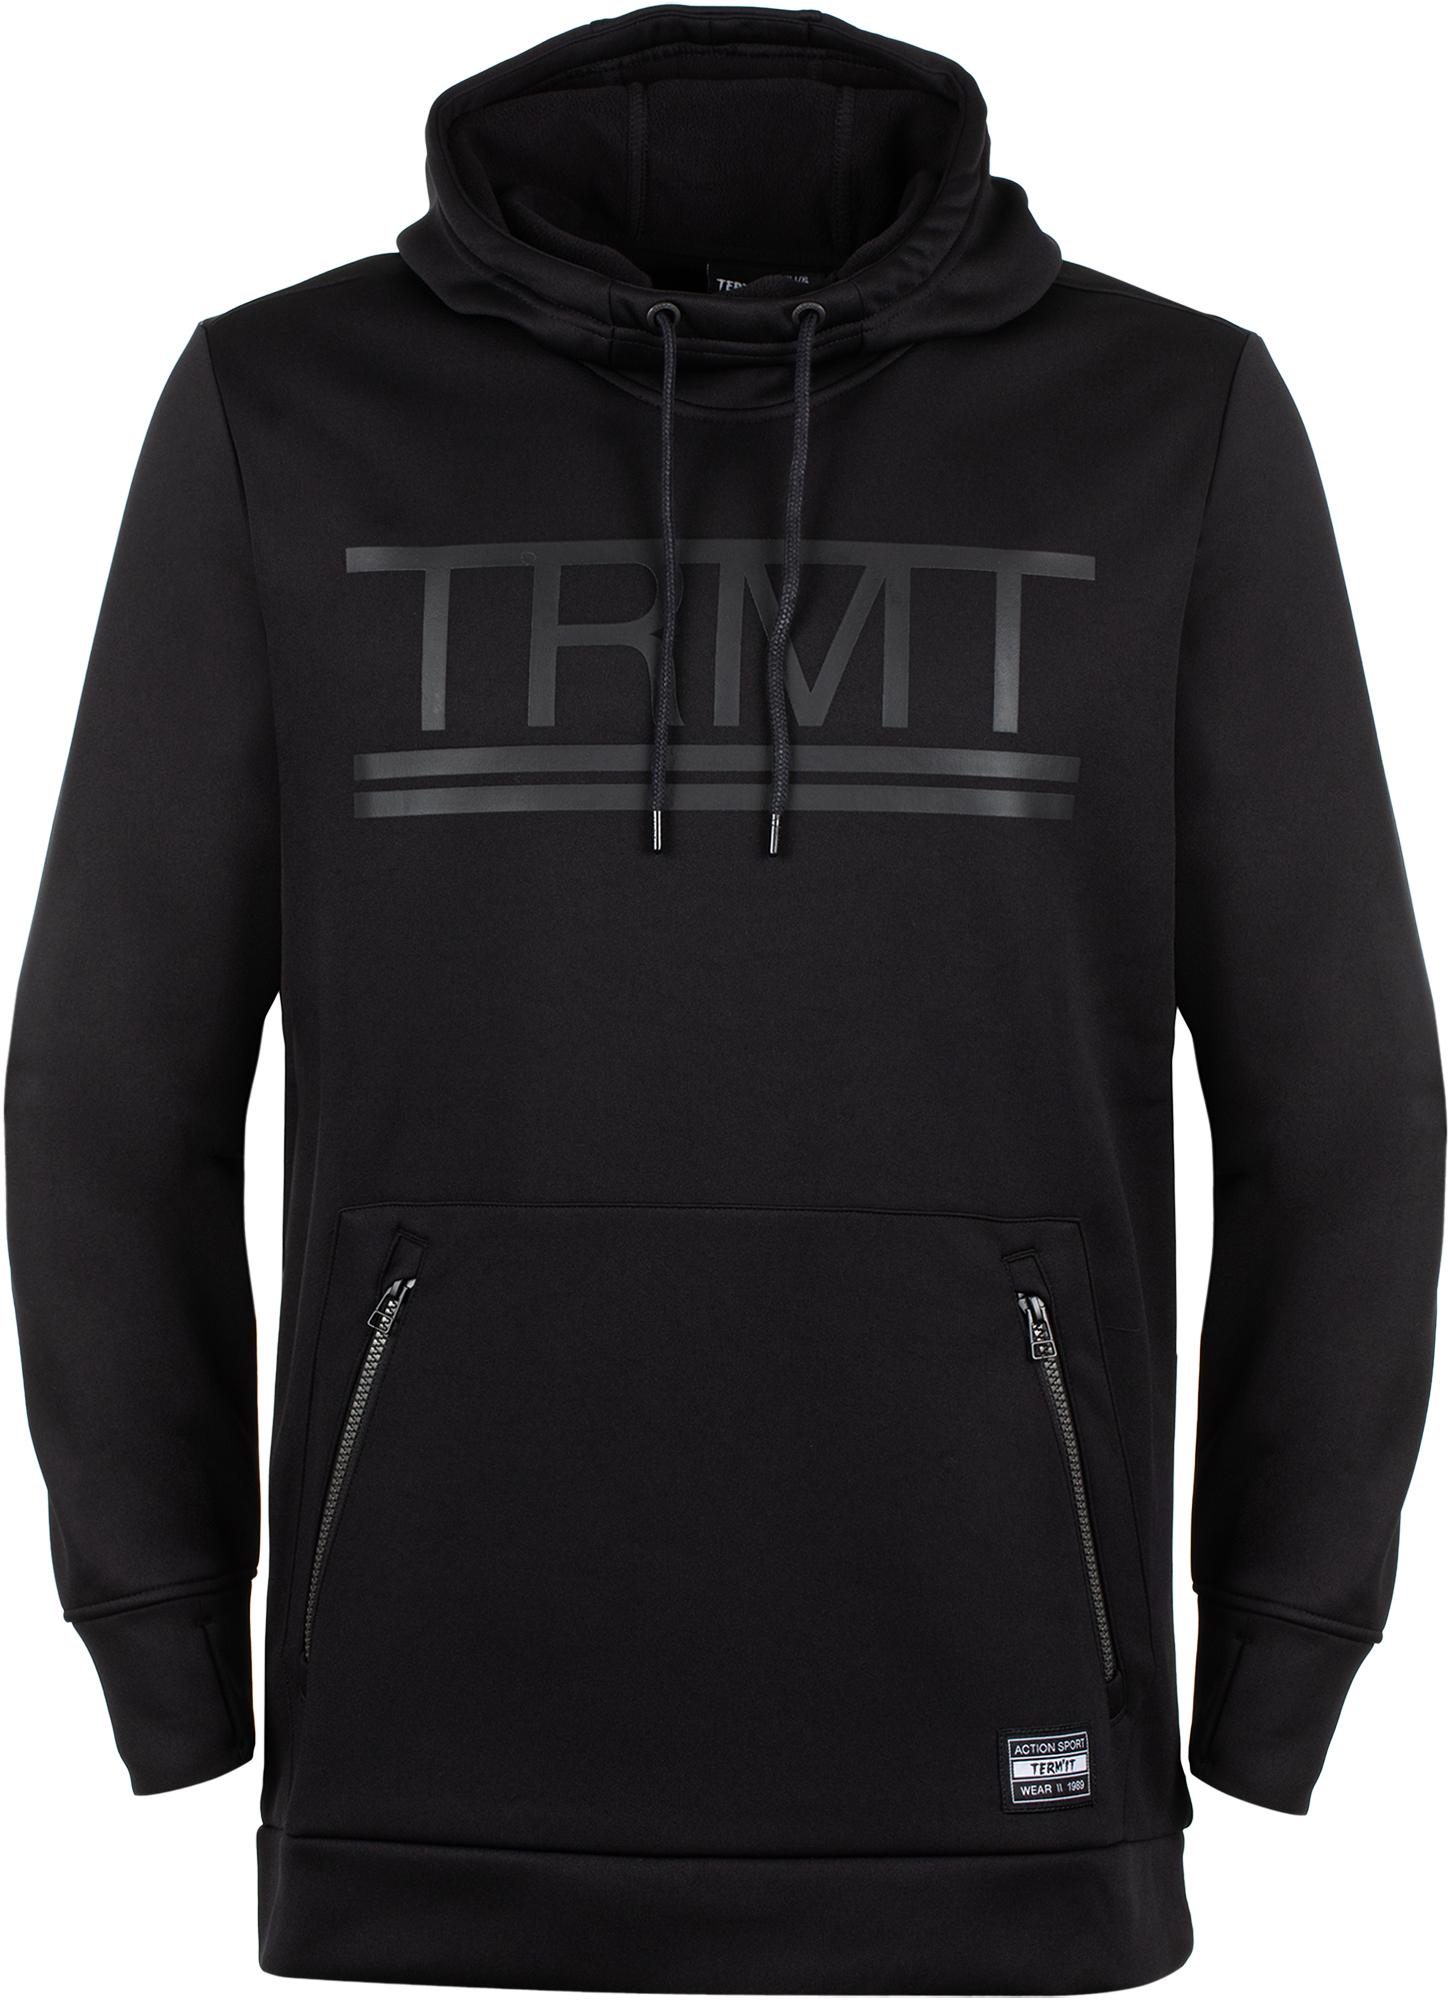 Termit Худи мужская Termit, размер 52